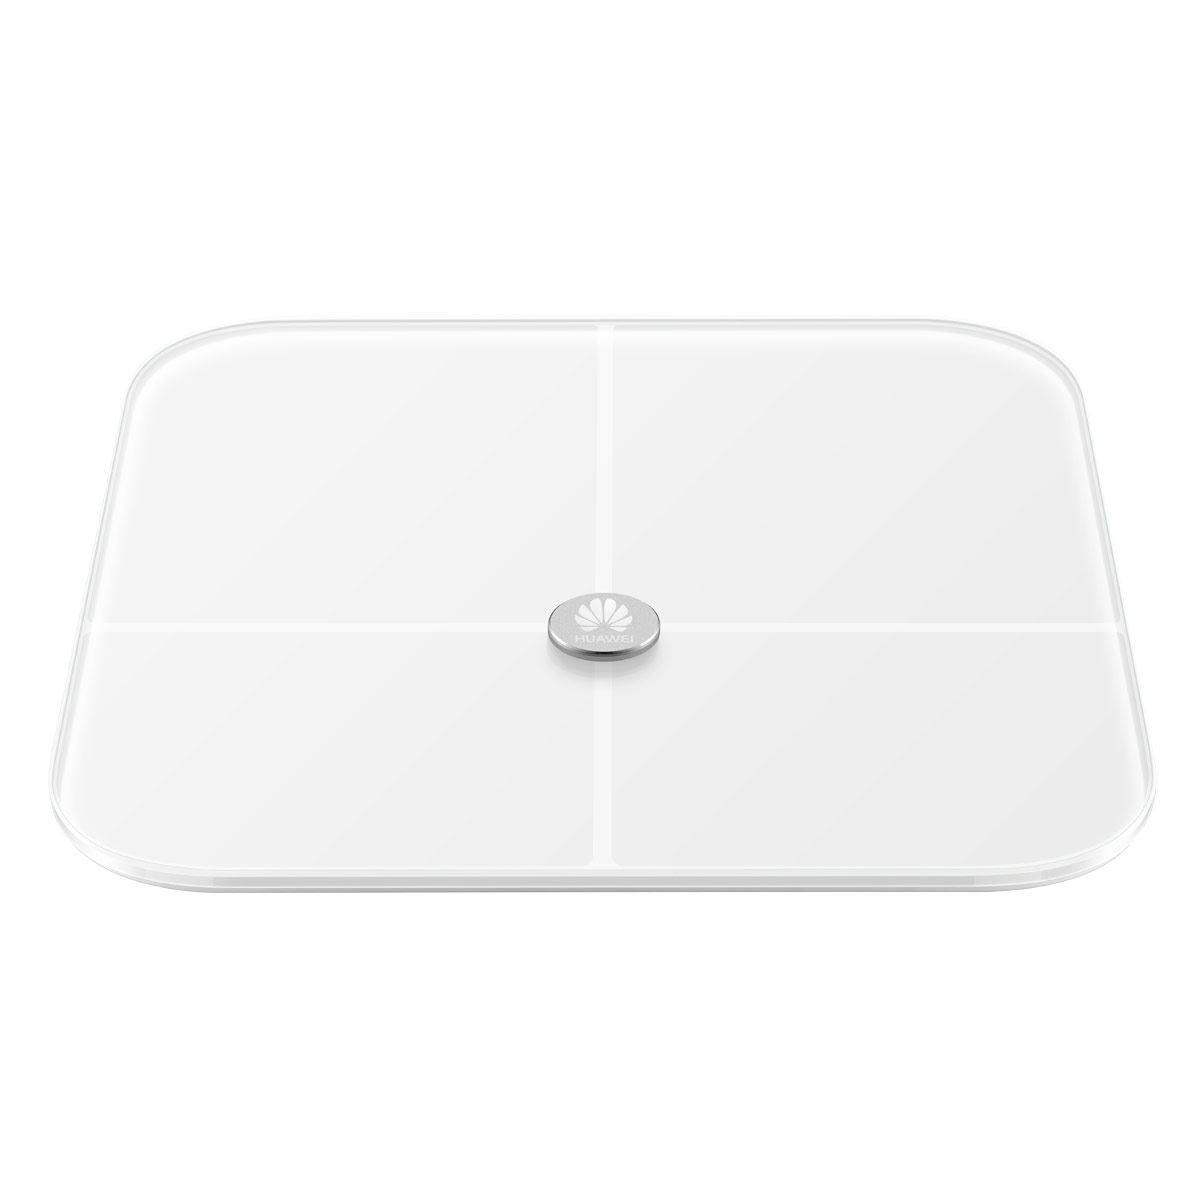 Báscula Huawei de Grasa Corporal Bluetooth Blanca